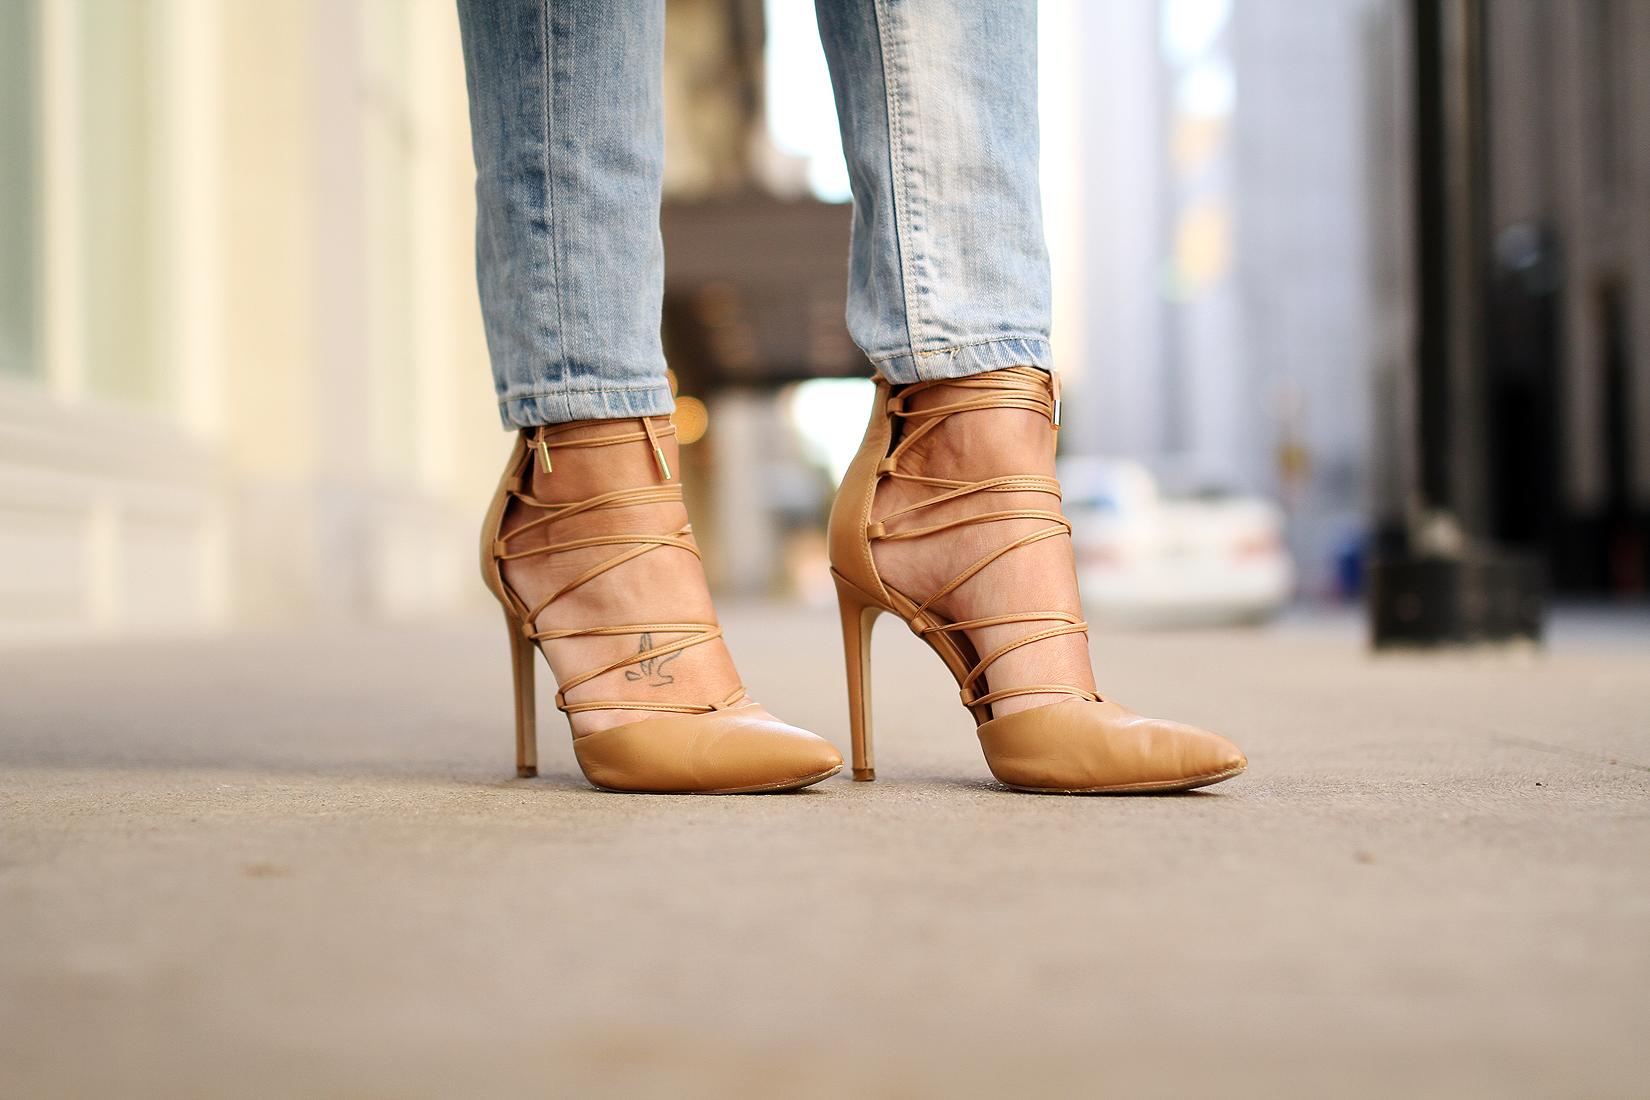 fashion-jackson-nude-lace-up-pumps